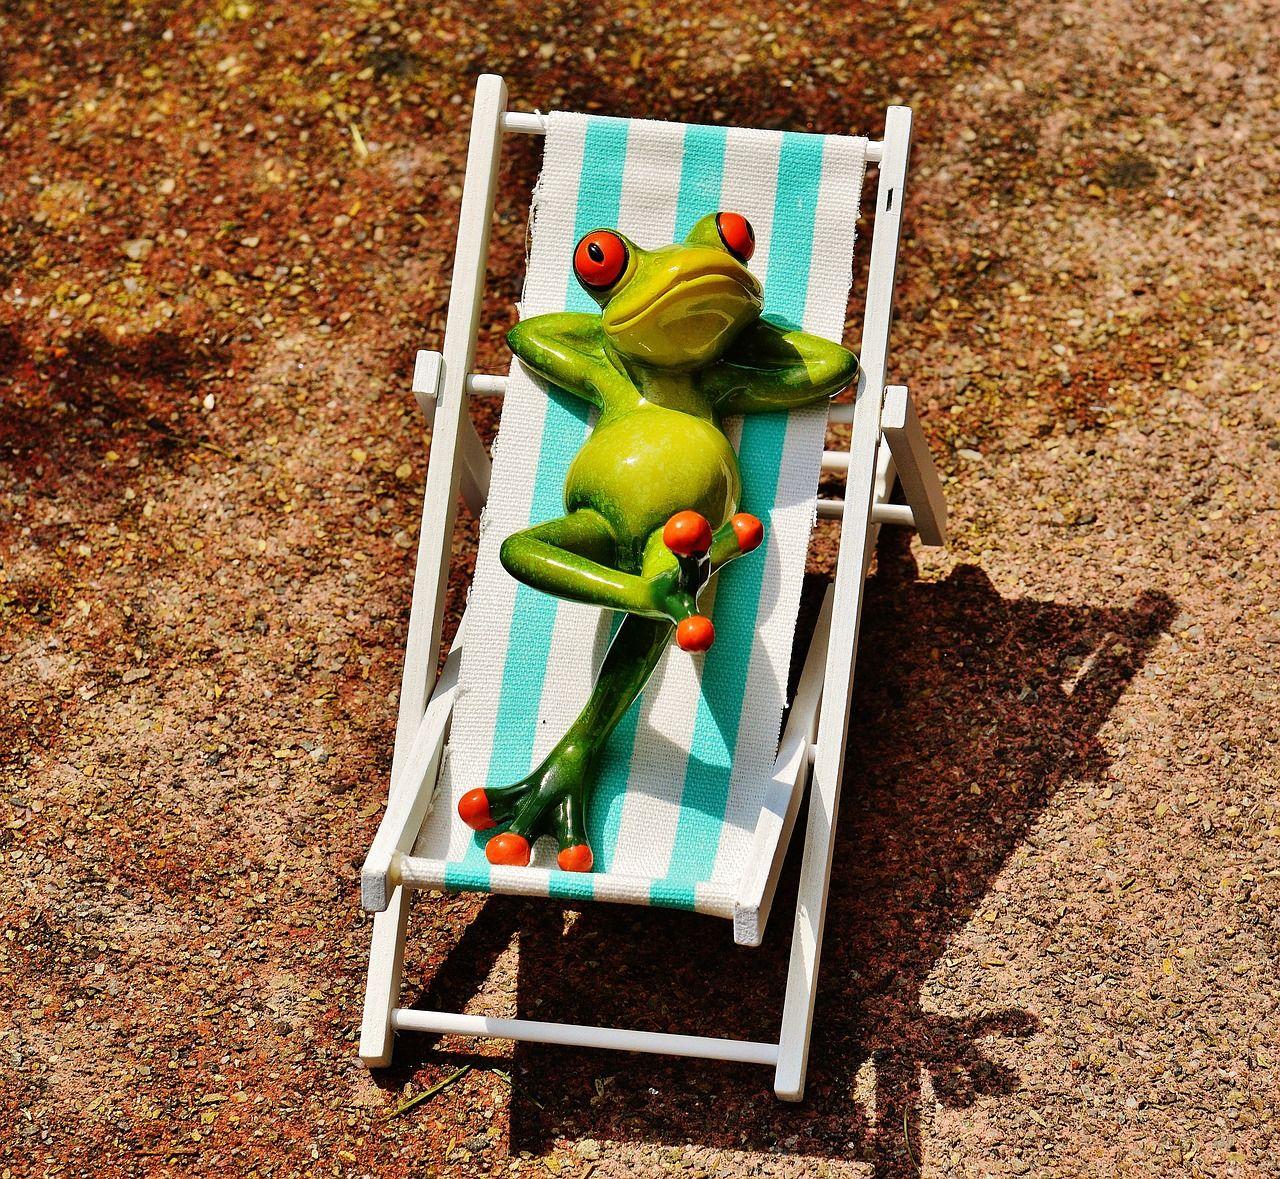 Vacation, Deck Chair, Beach, Frog, Summer, Sun vacation